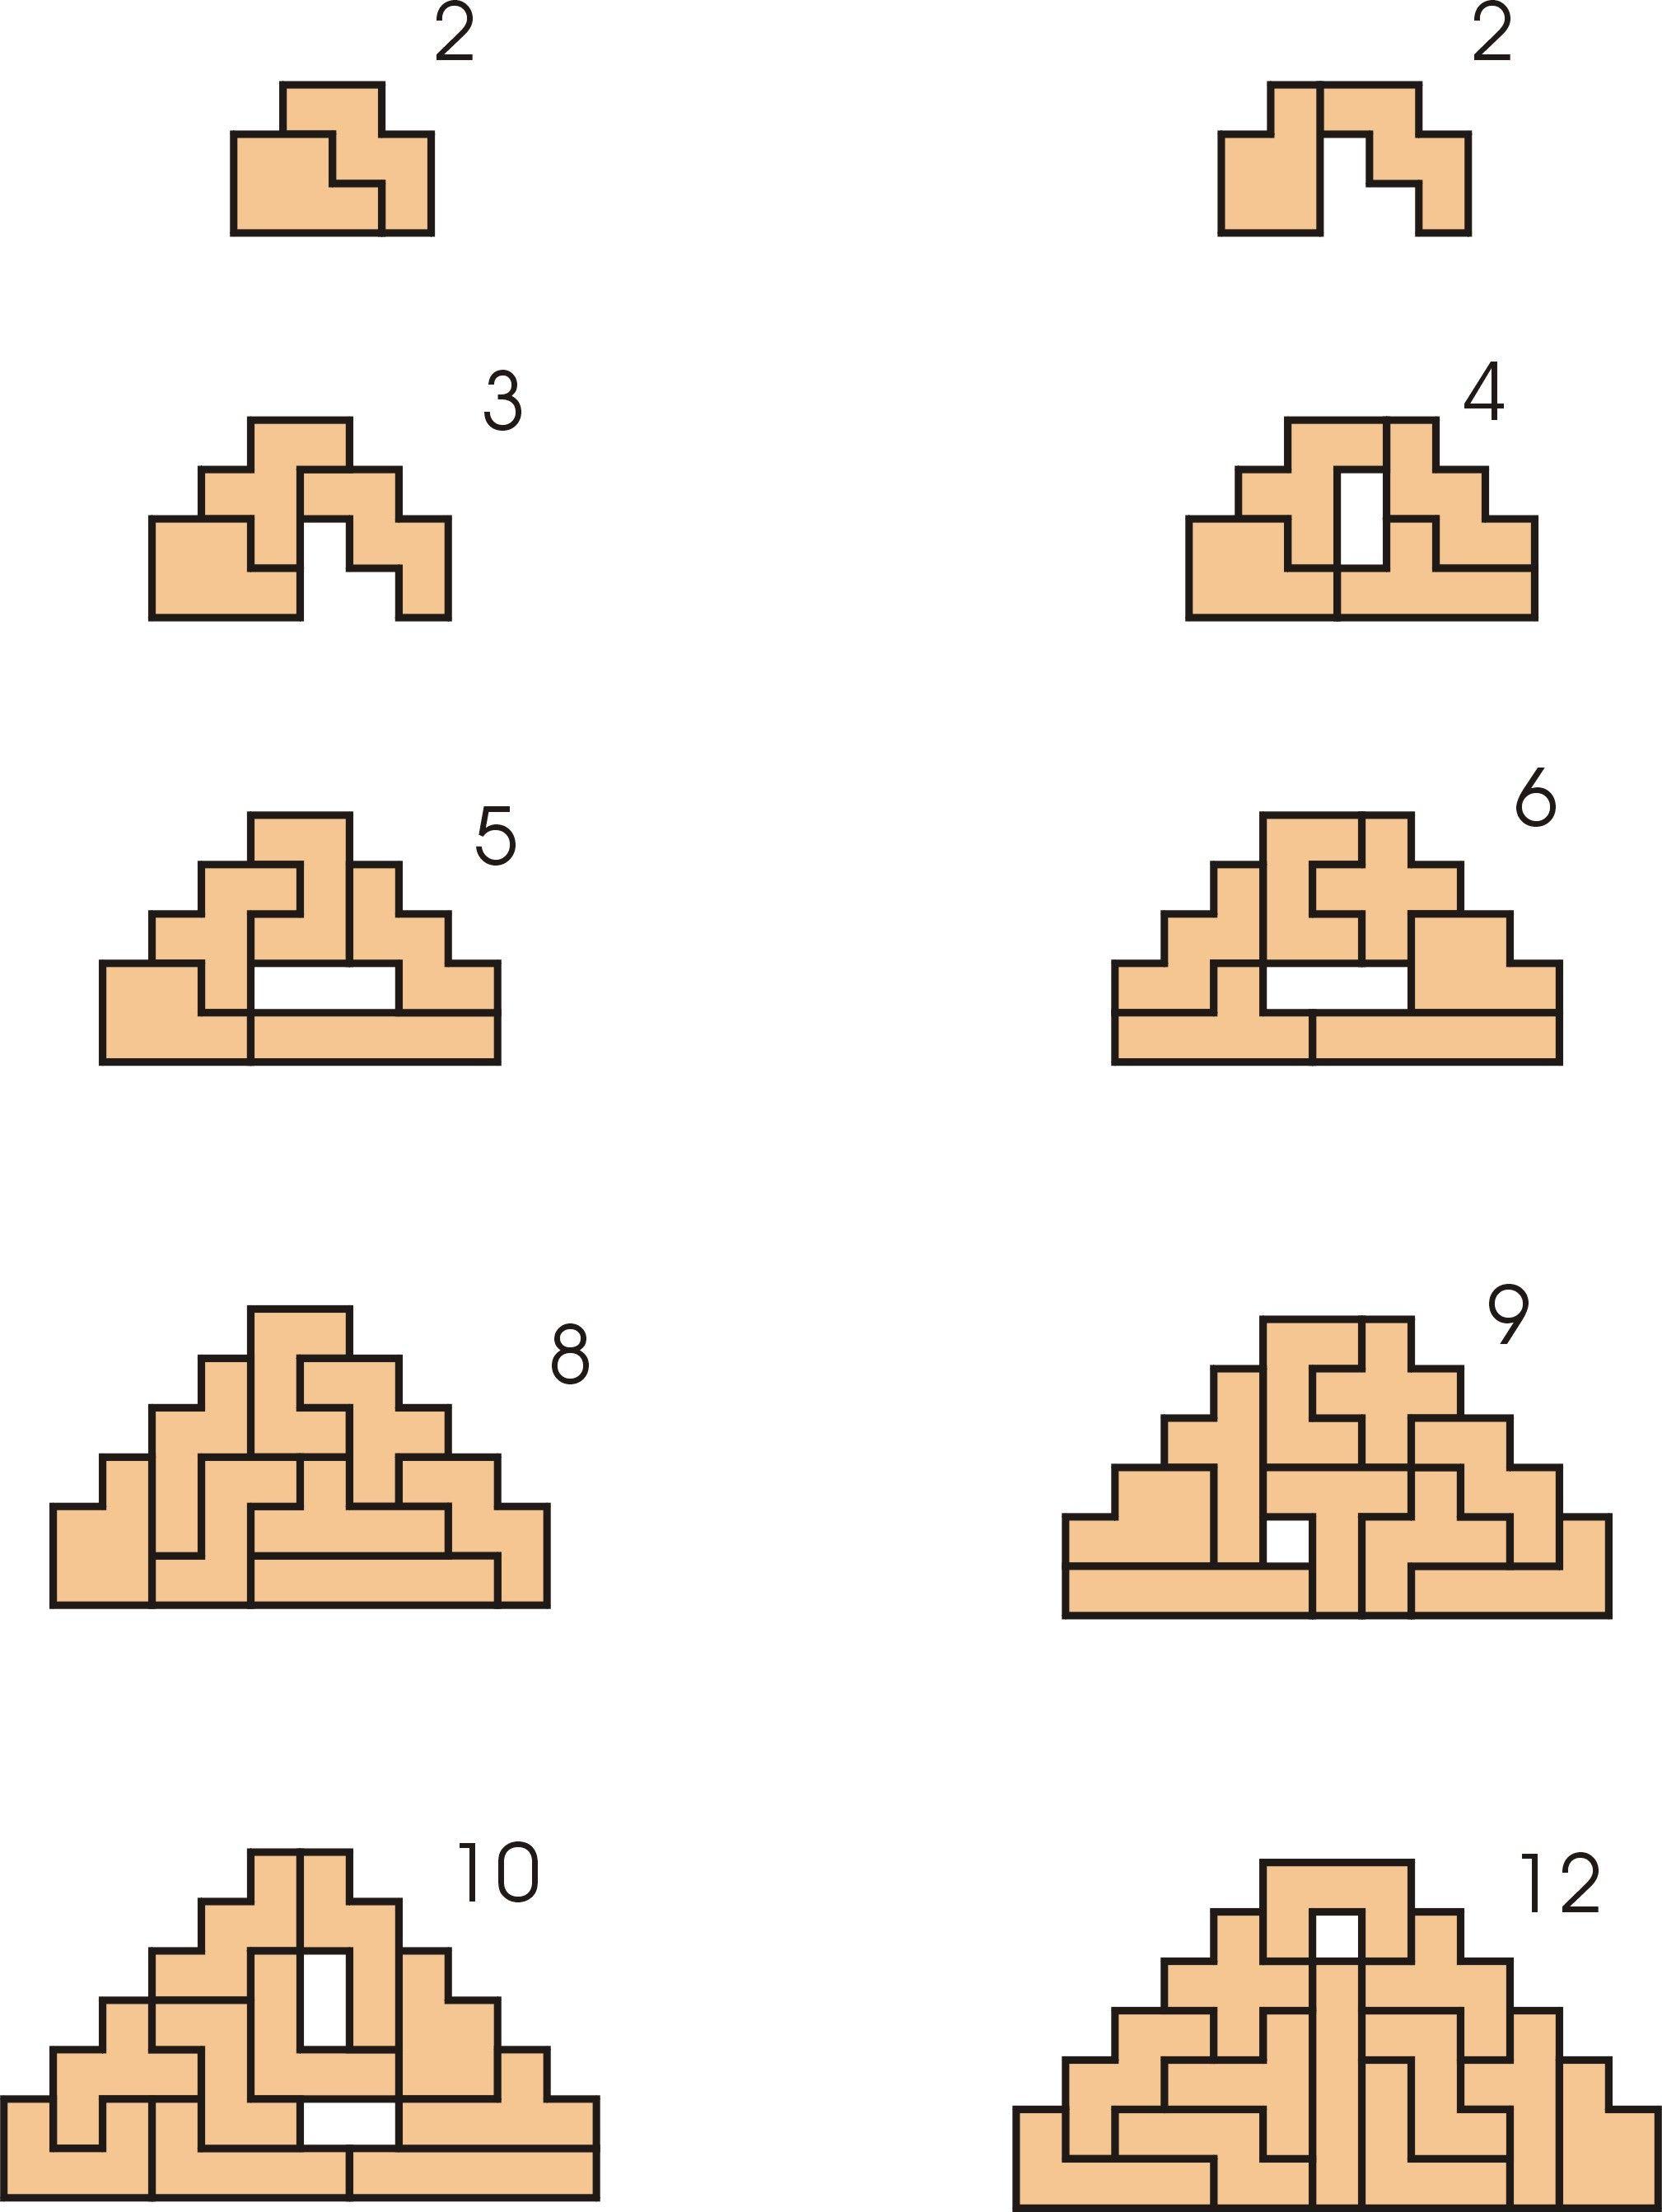 worksheet Pentominoes Worksheet pyramids with blunted points using one set of pentominoes pentominoes